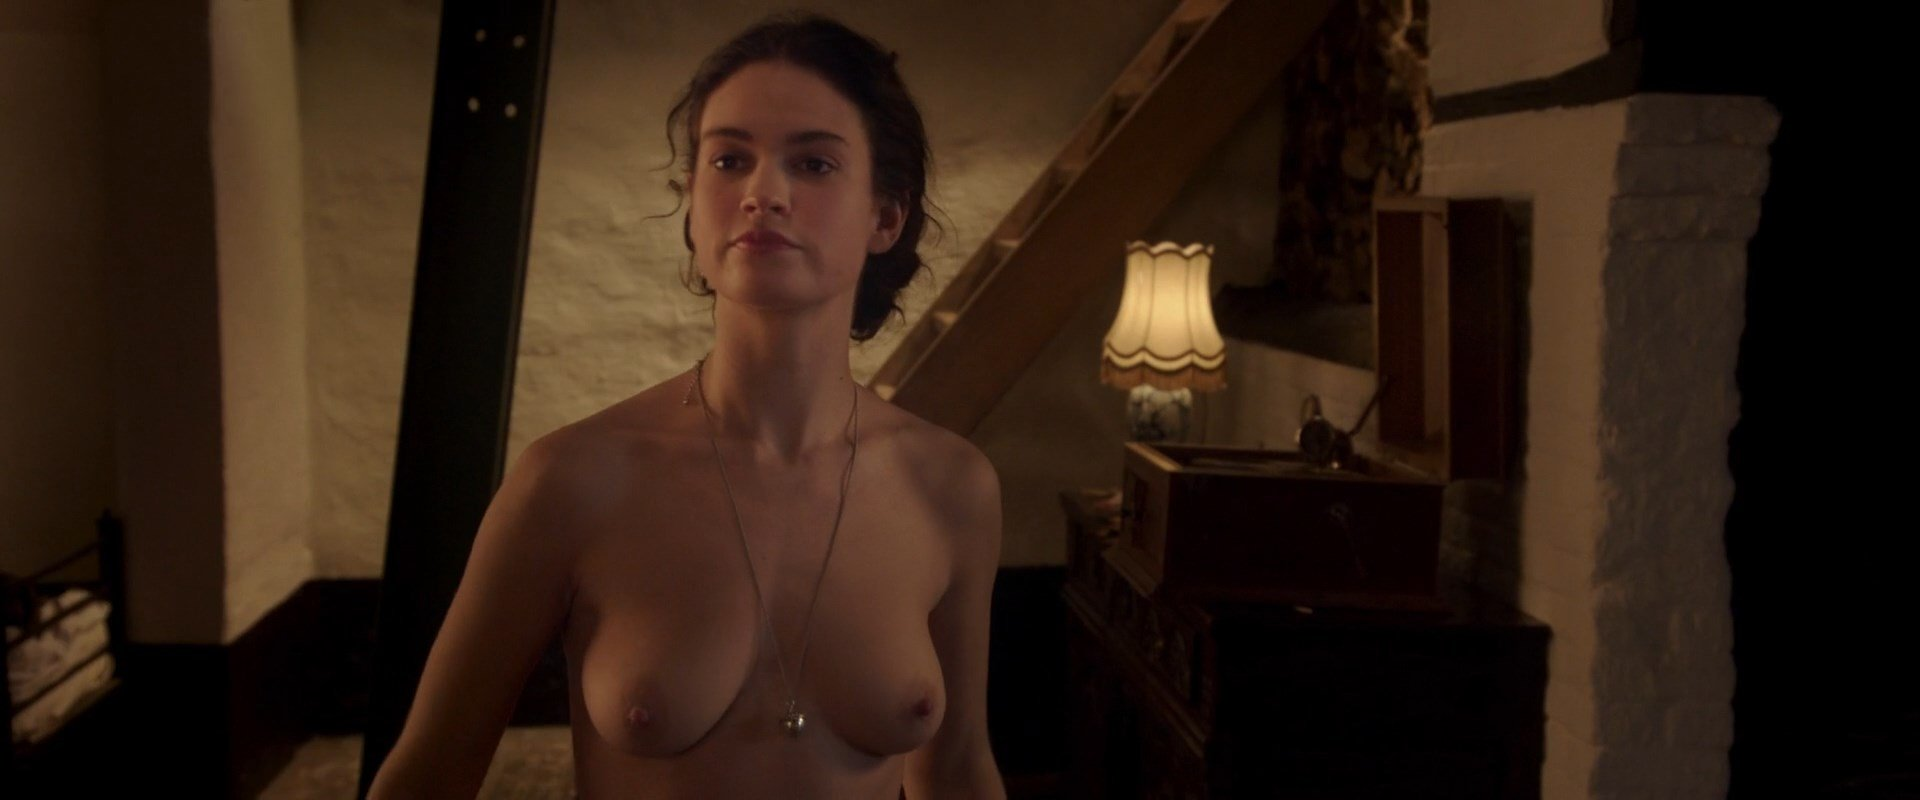 Nude beach lesbian sex